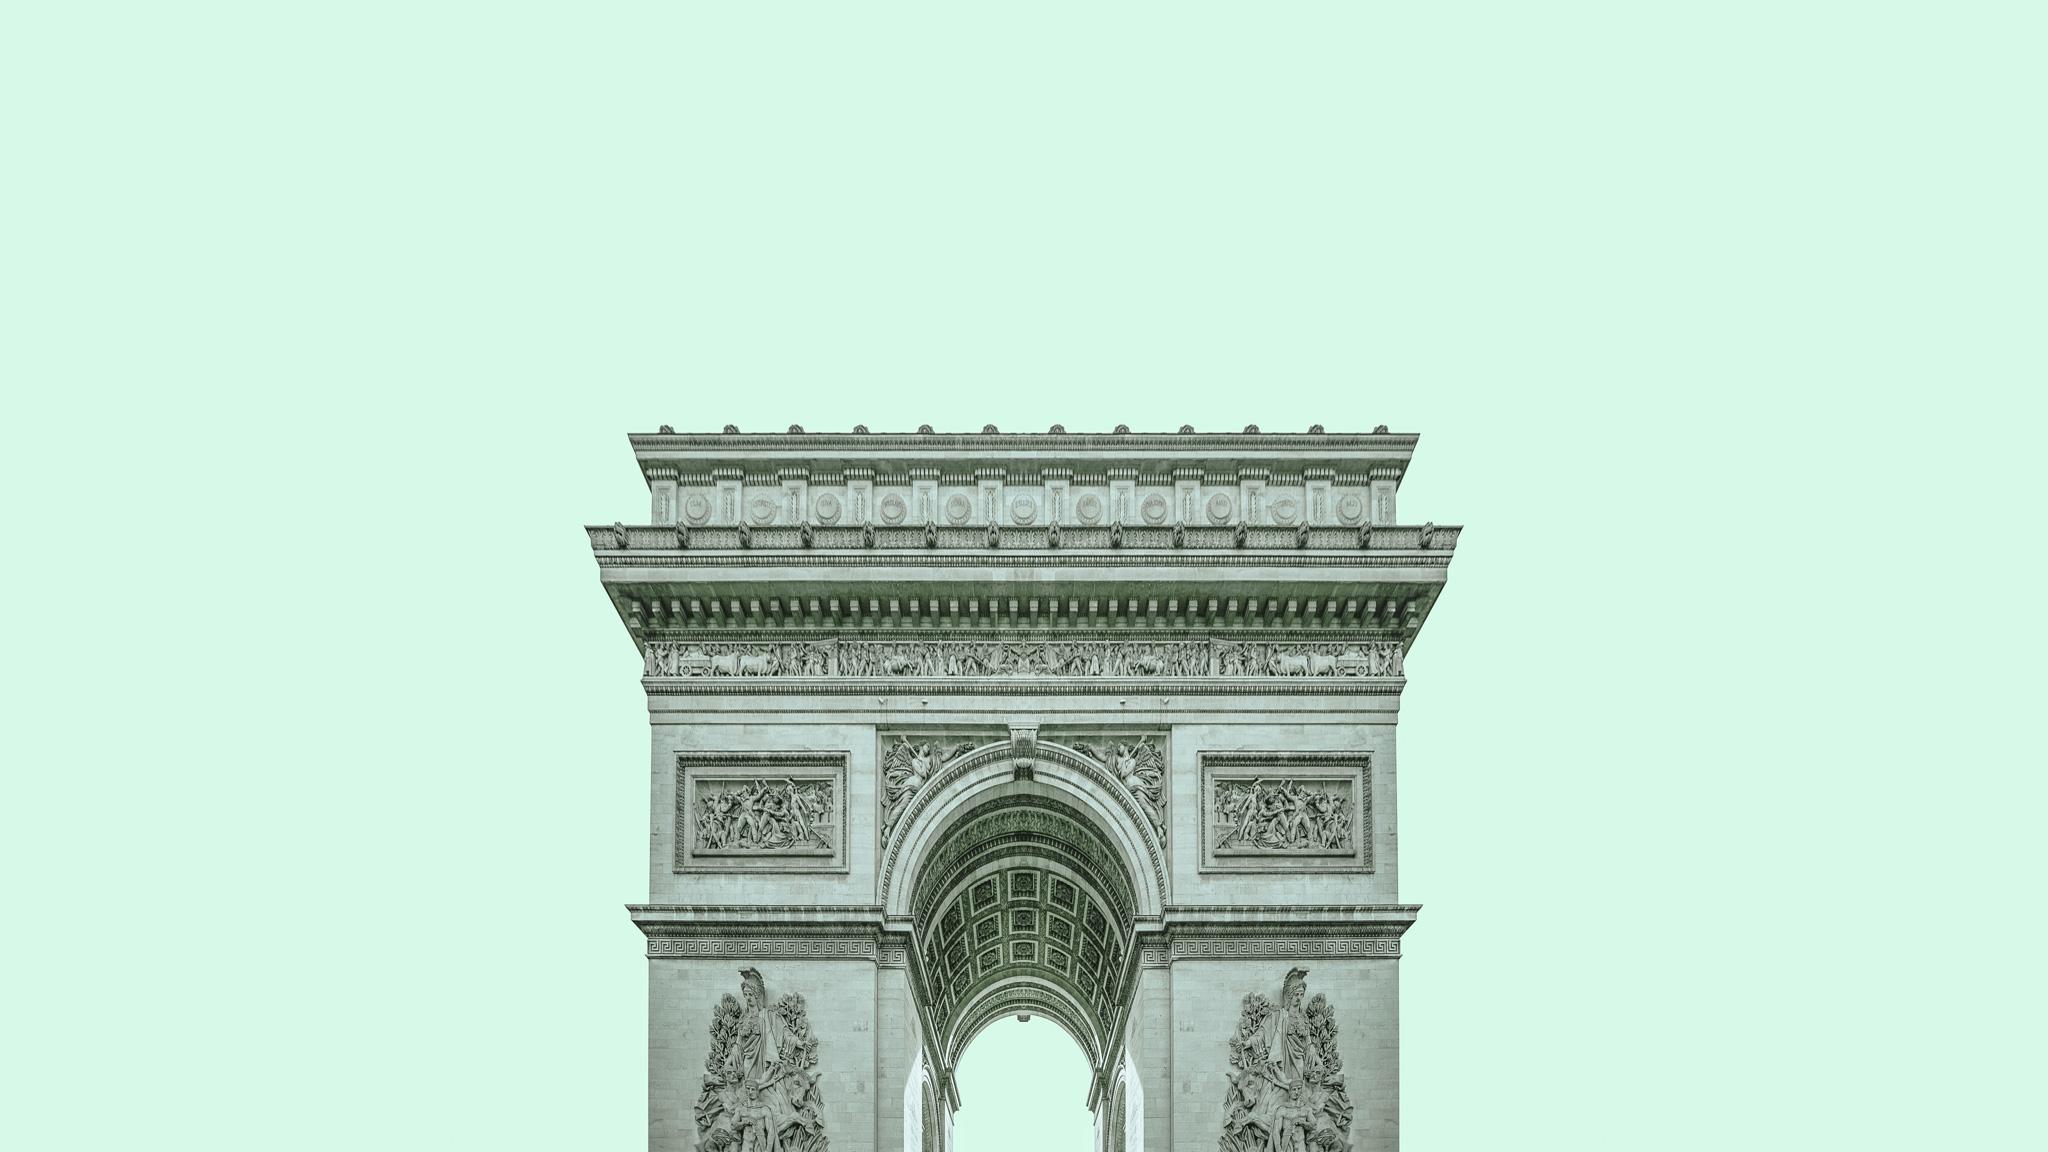 minimalPARIS - Arc de Triomphe - zaiczdomokos.com